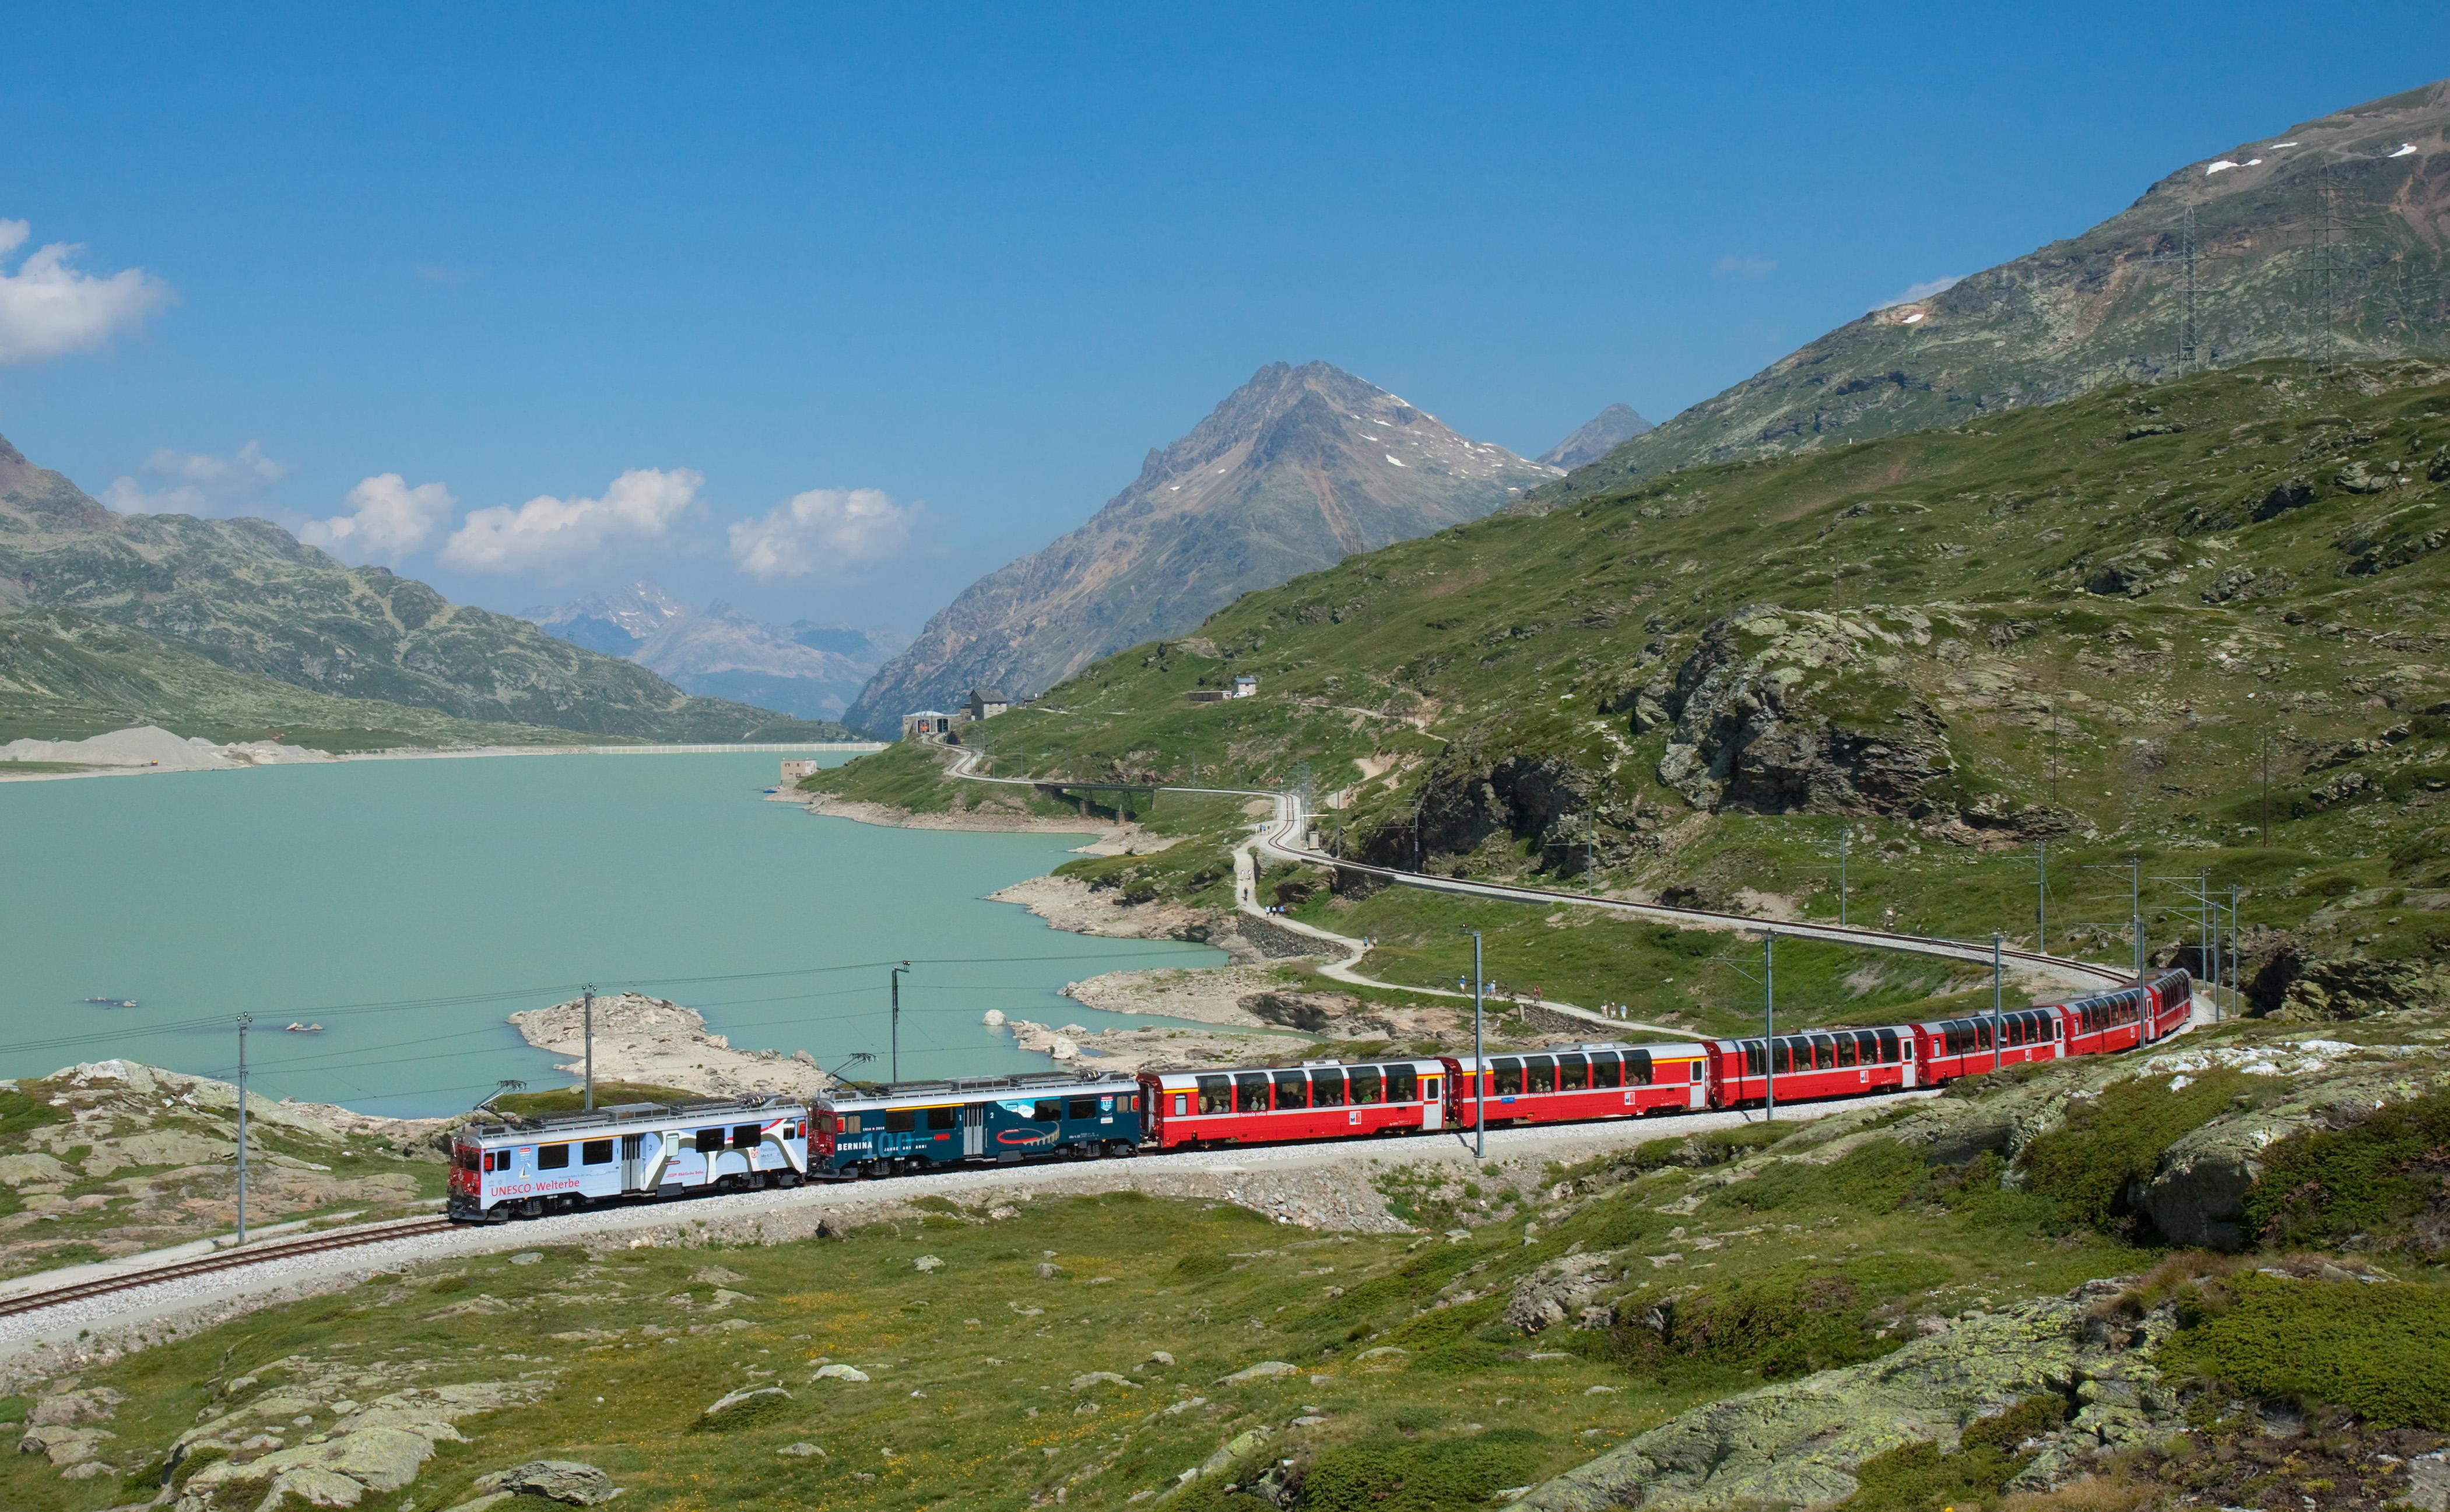 https://i0.wp.com/upload.wikimedia.org/wikipedia/commons/7/7c/RhB_ABe_4-4_III_mit_Bernina-Express_am_Lago_Bianco.jpg